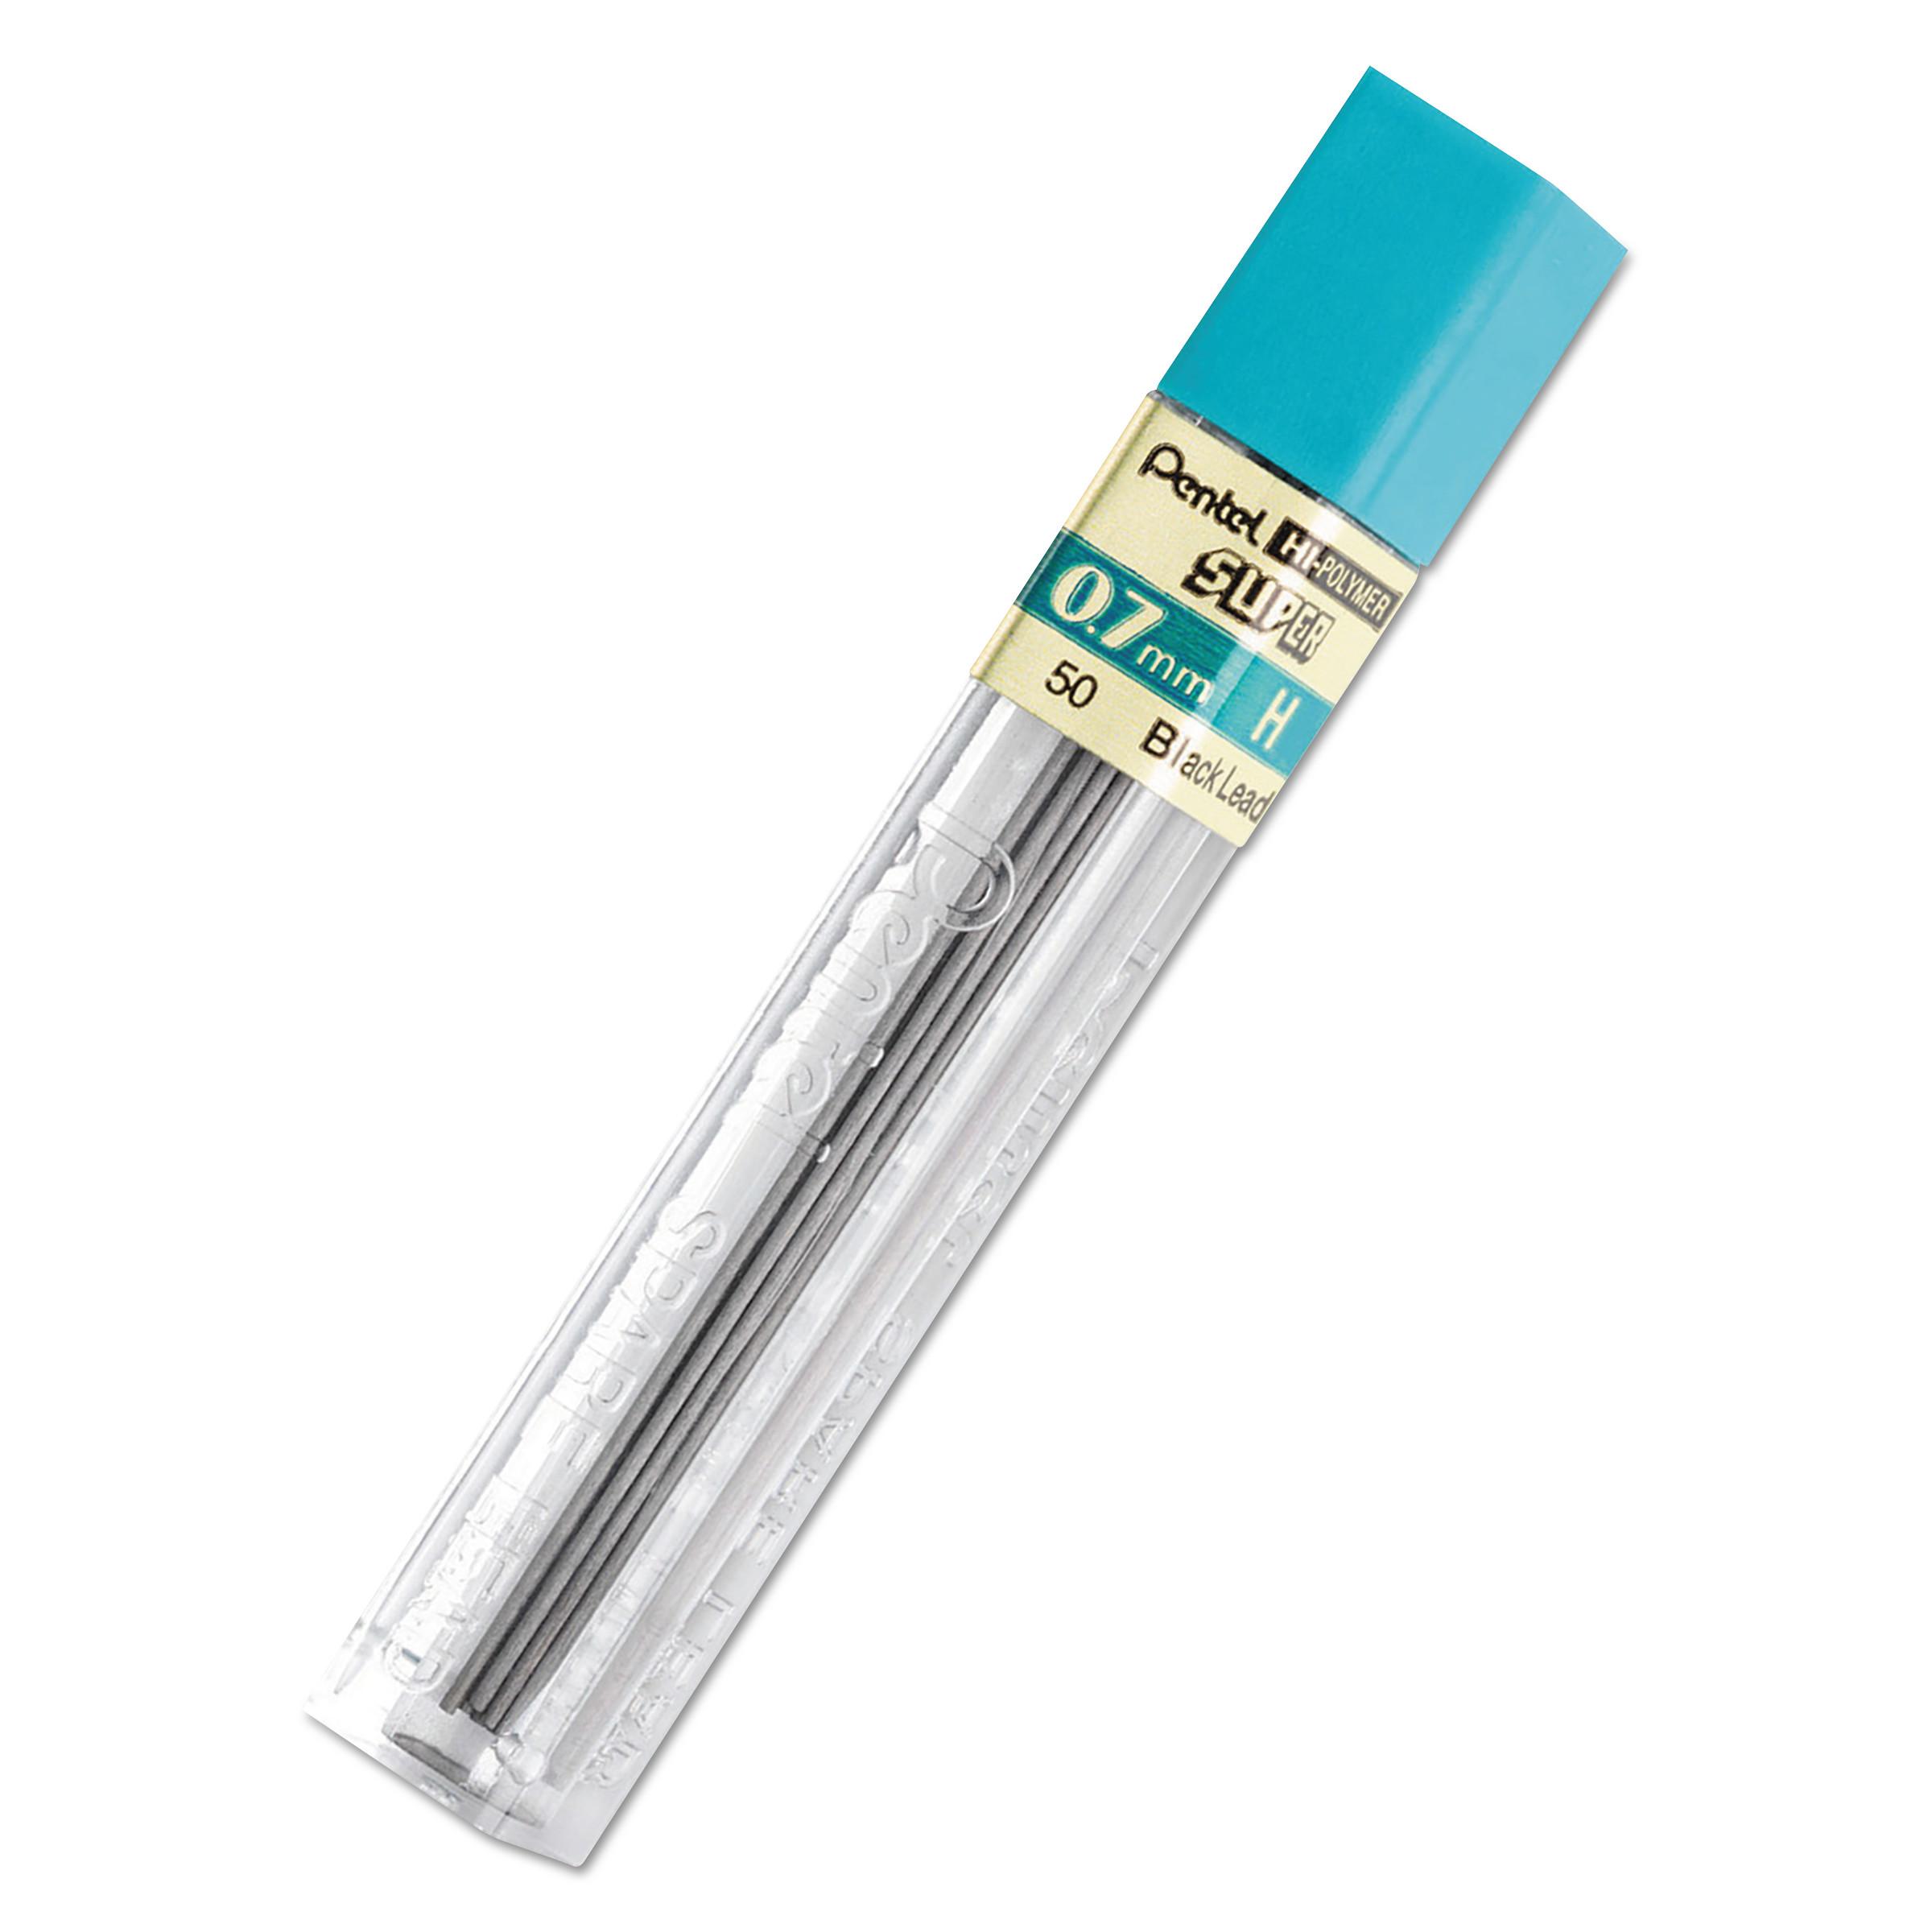 Super Hi-Polymer Lead Refills, 0.7 mm, H, Black, 12/Tube